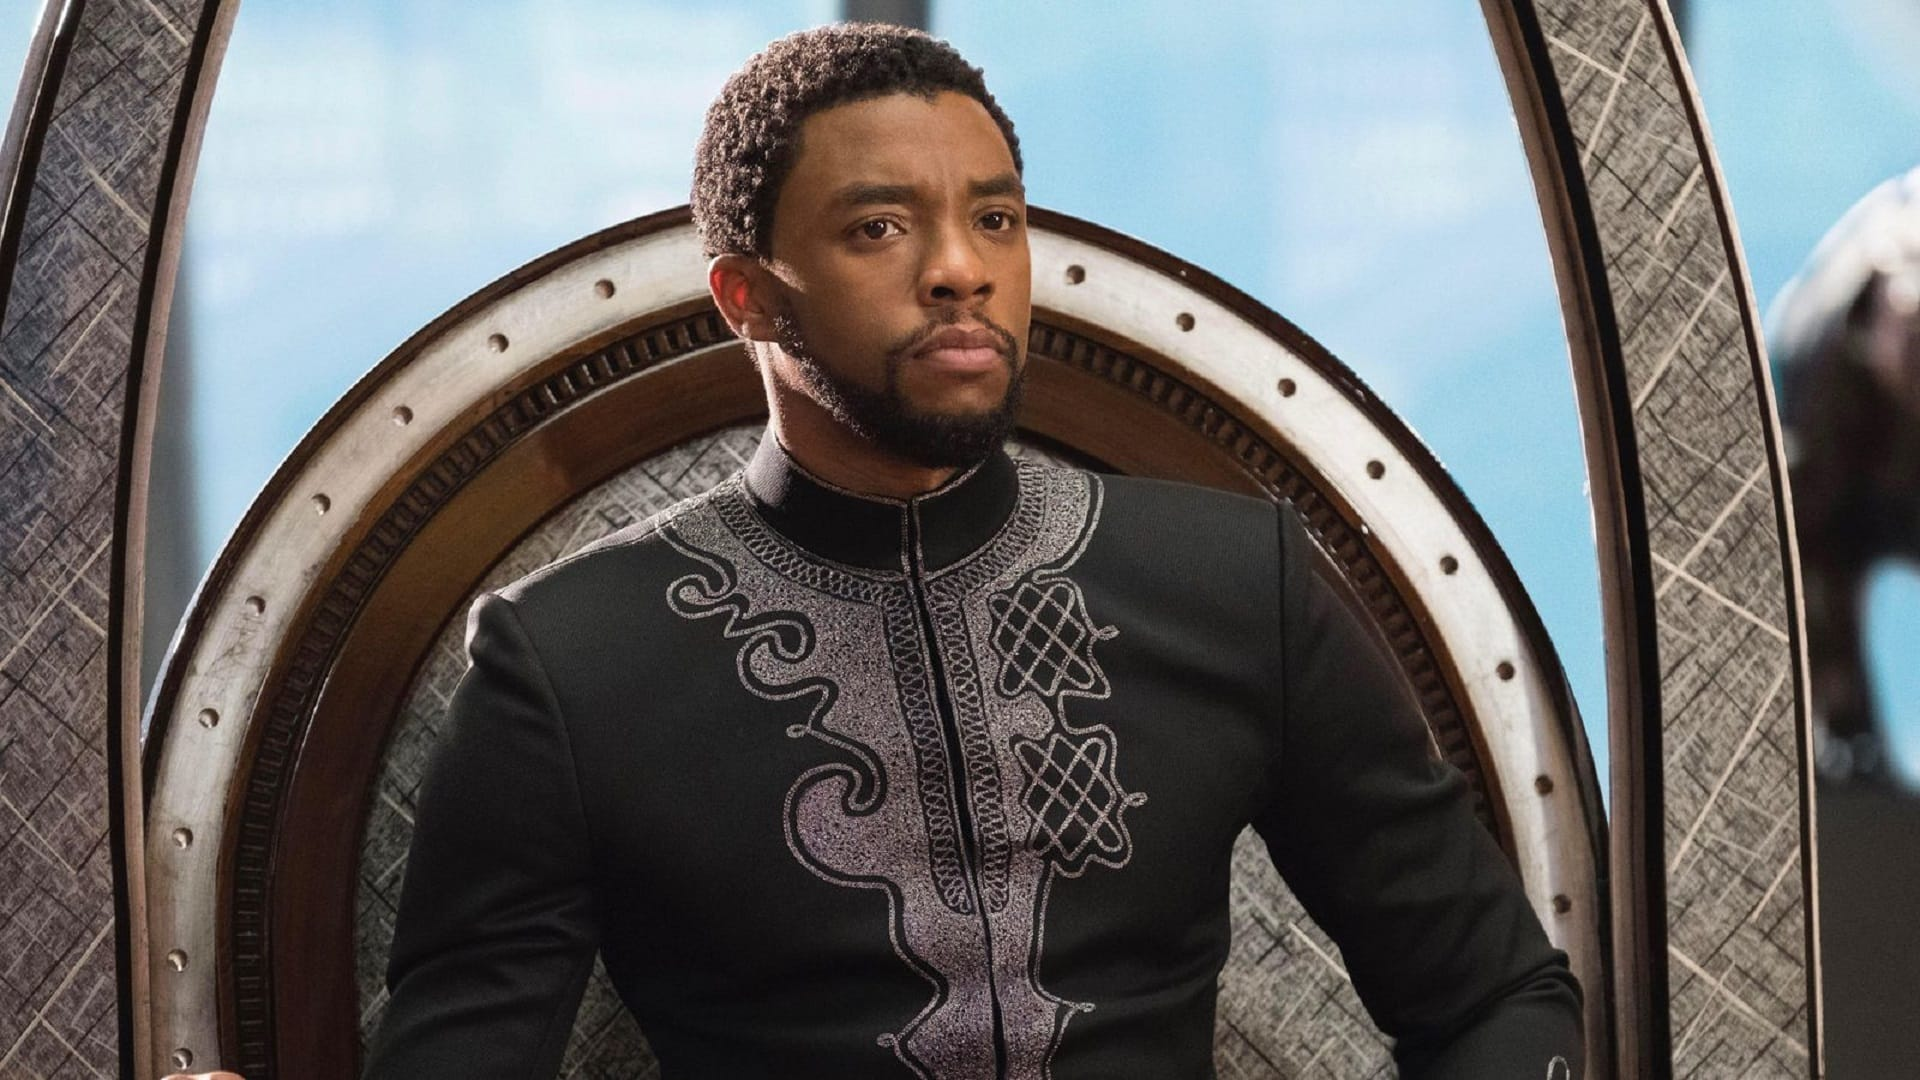 Black Panther: fan preoccupati per la perdita di peso di Chadwick Boseman